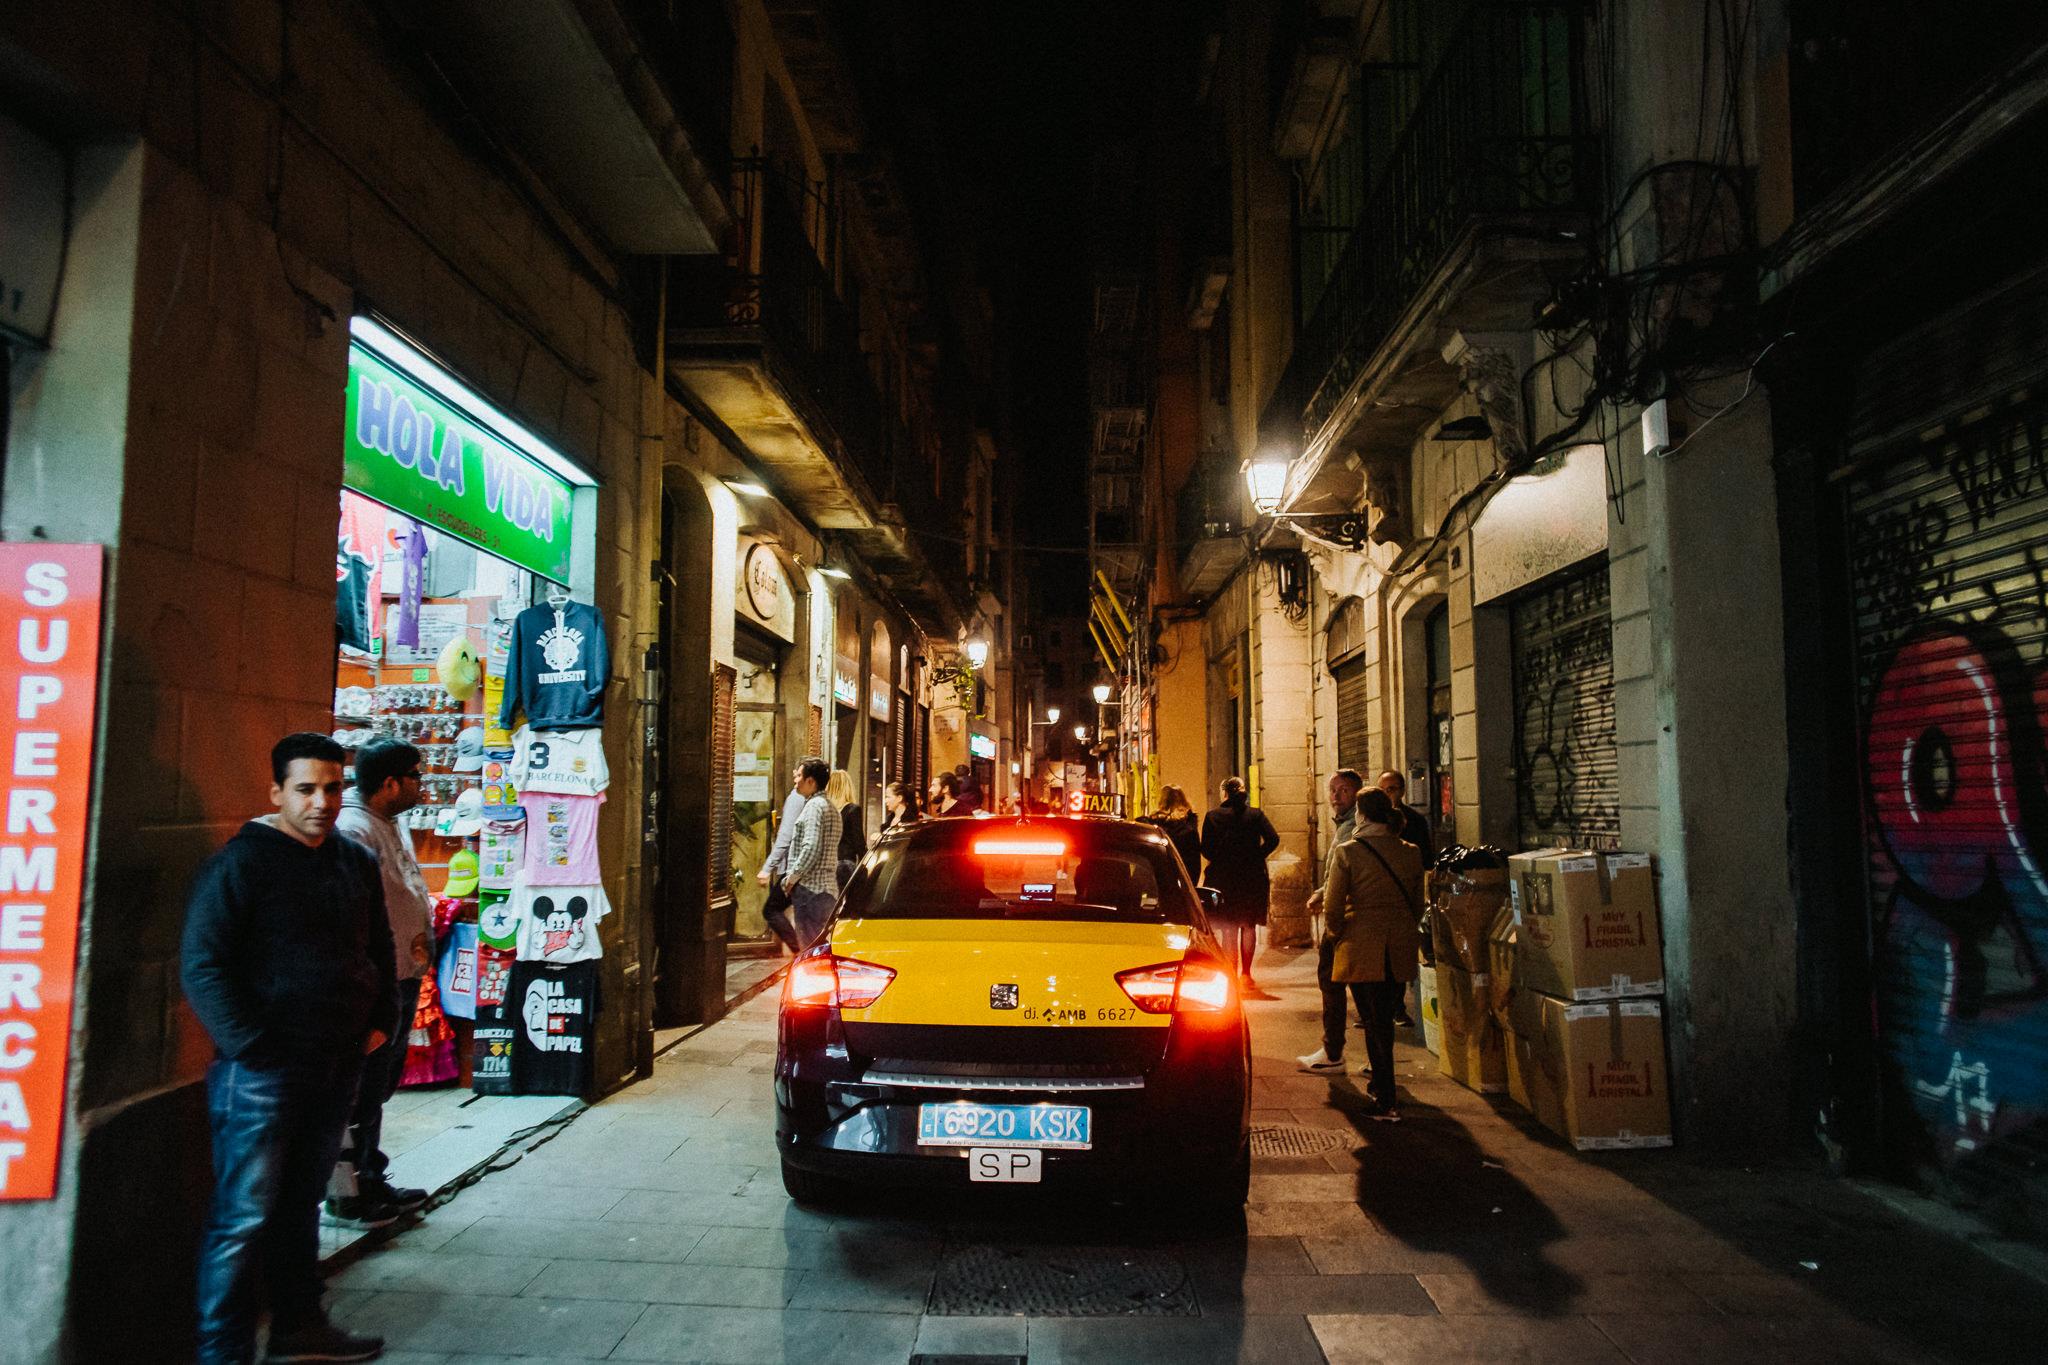 Barcelona-destination-photographer-alfred-tang-42.jpg